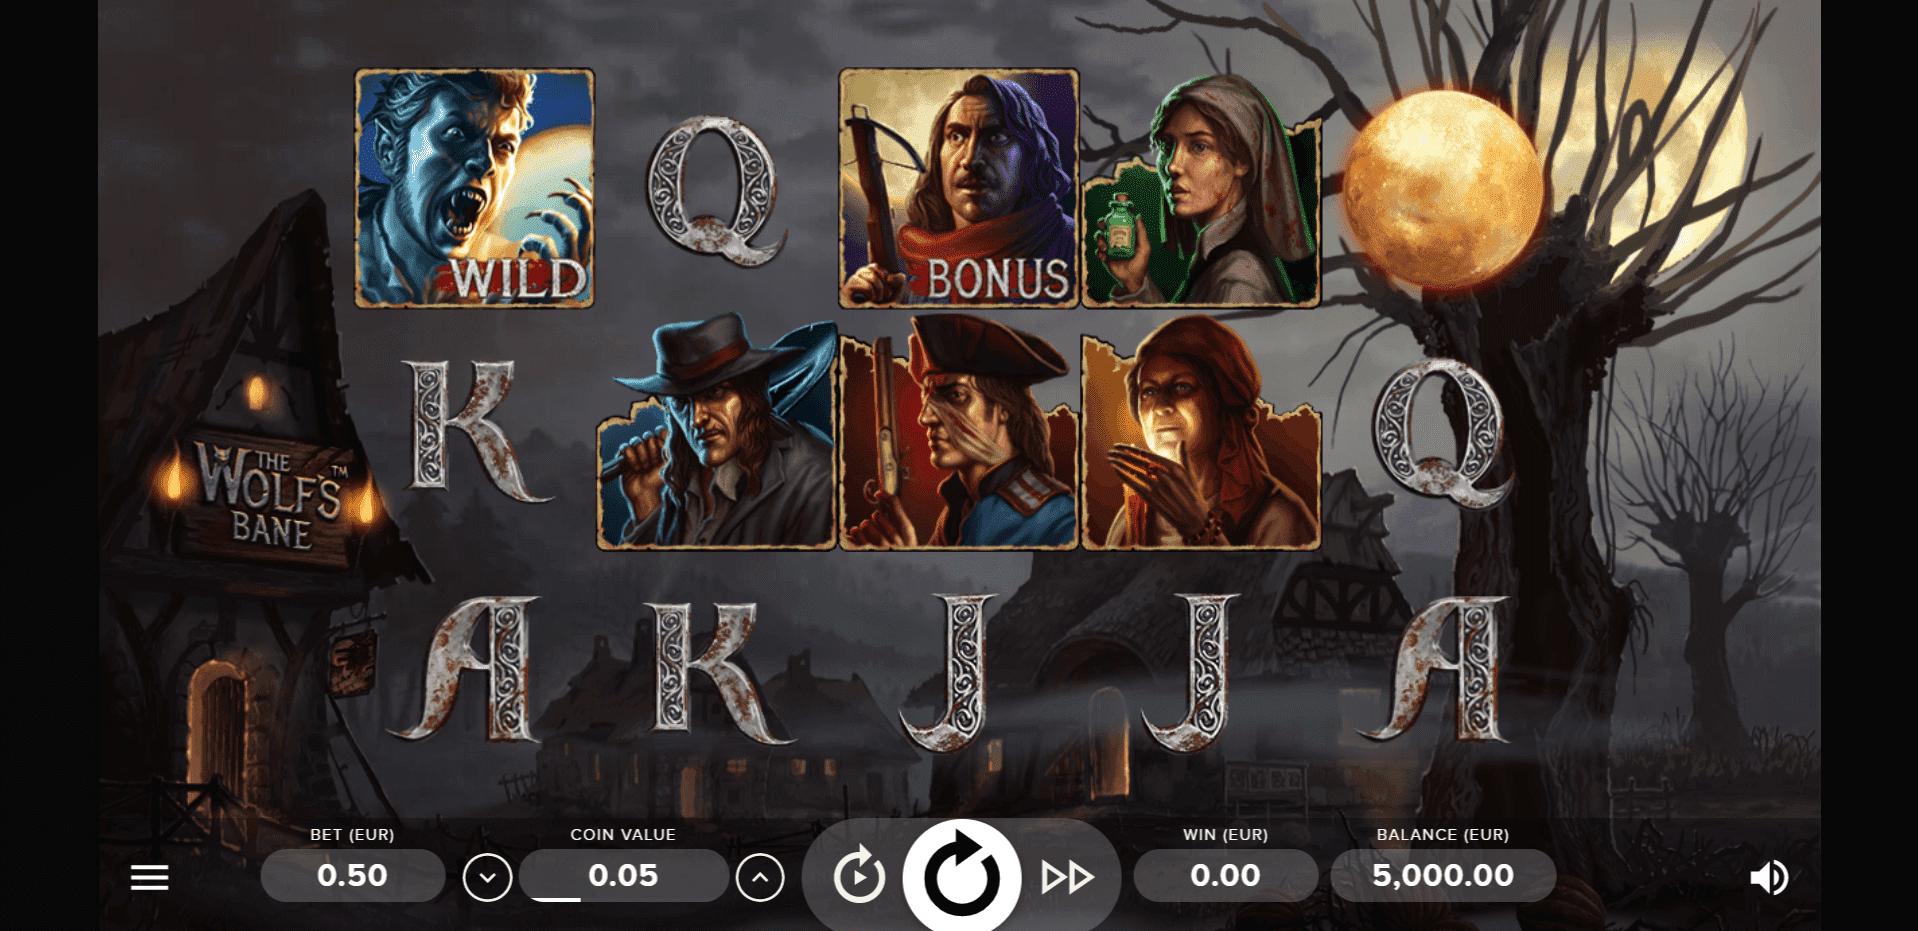 The Wolfs Bane slot machine screenshot